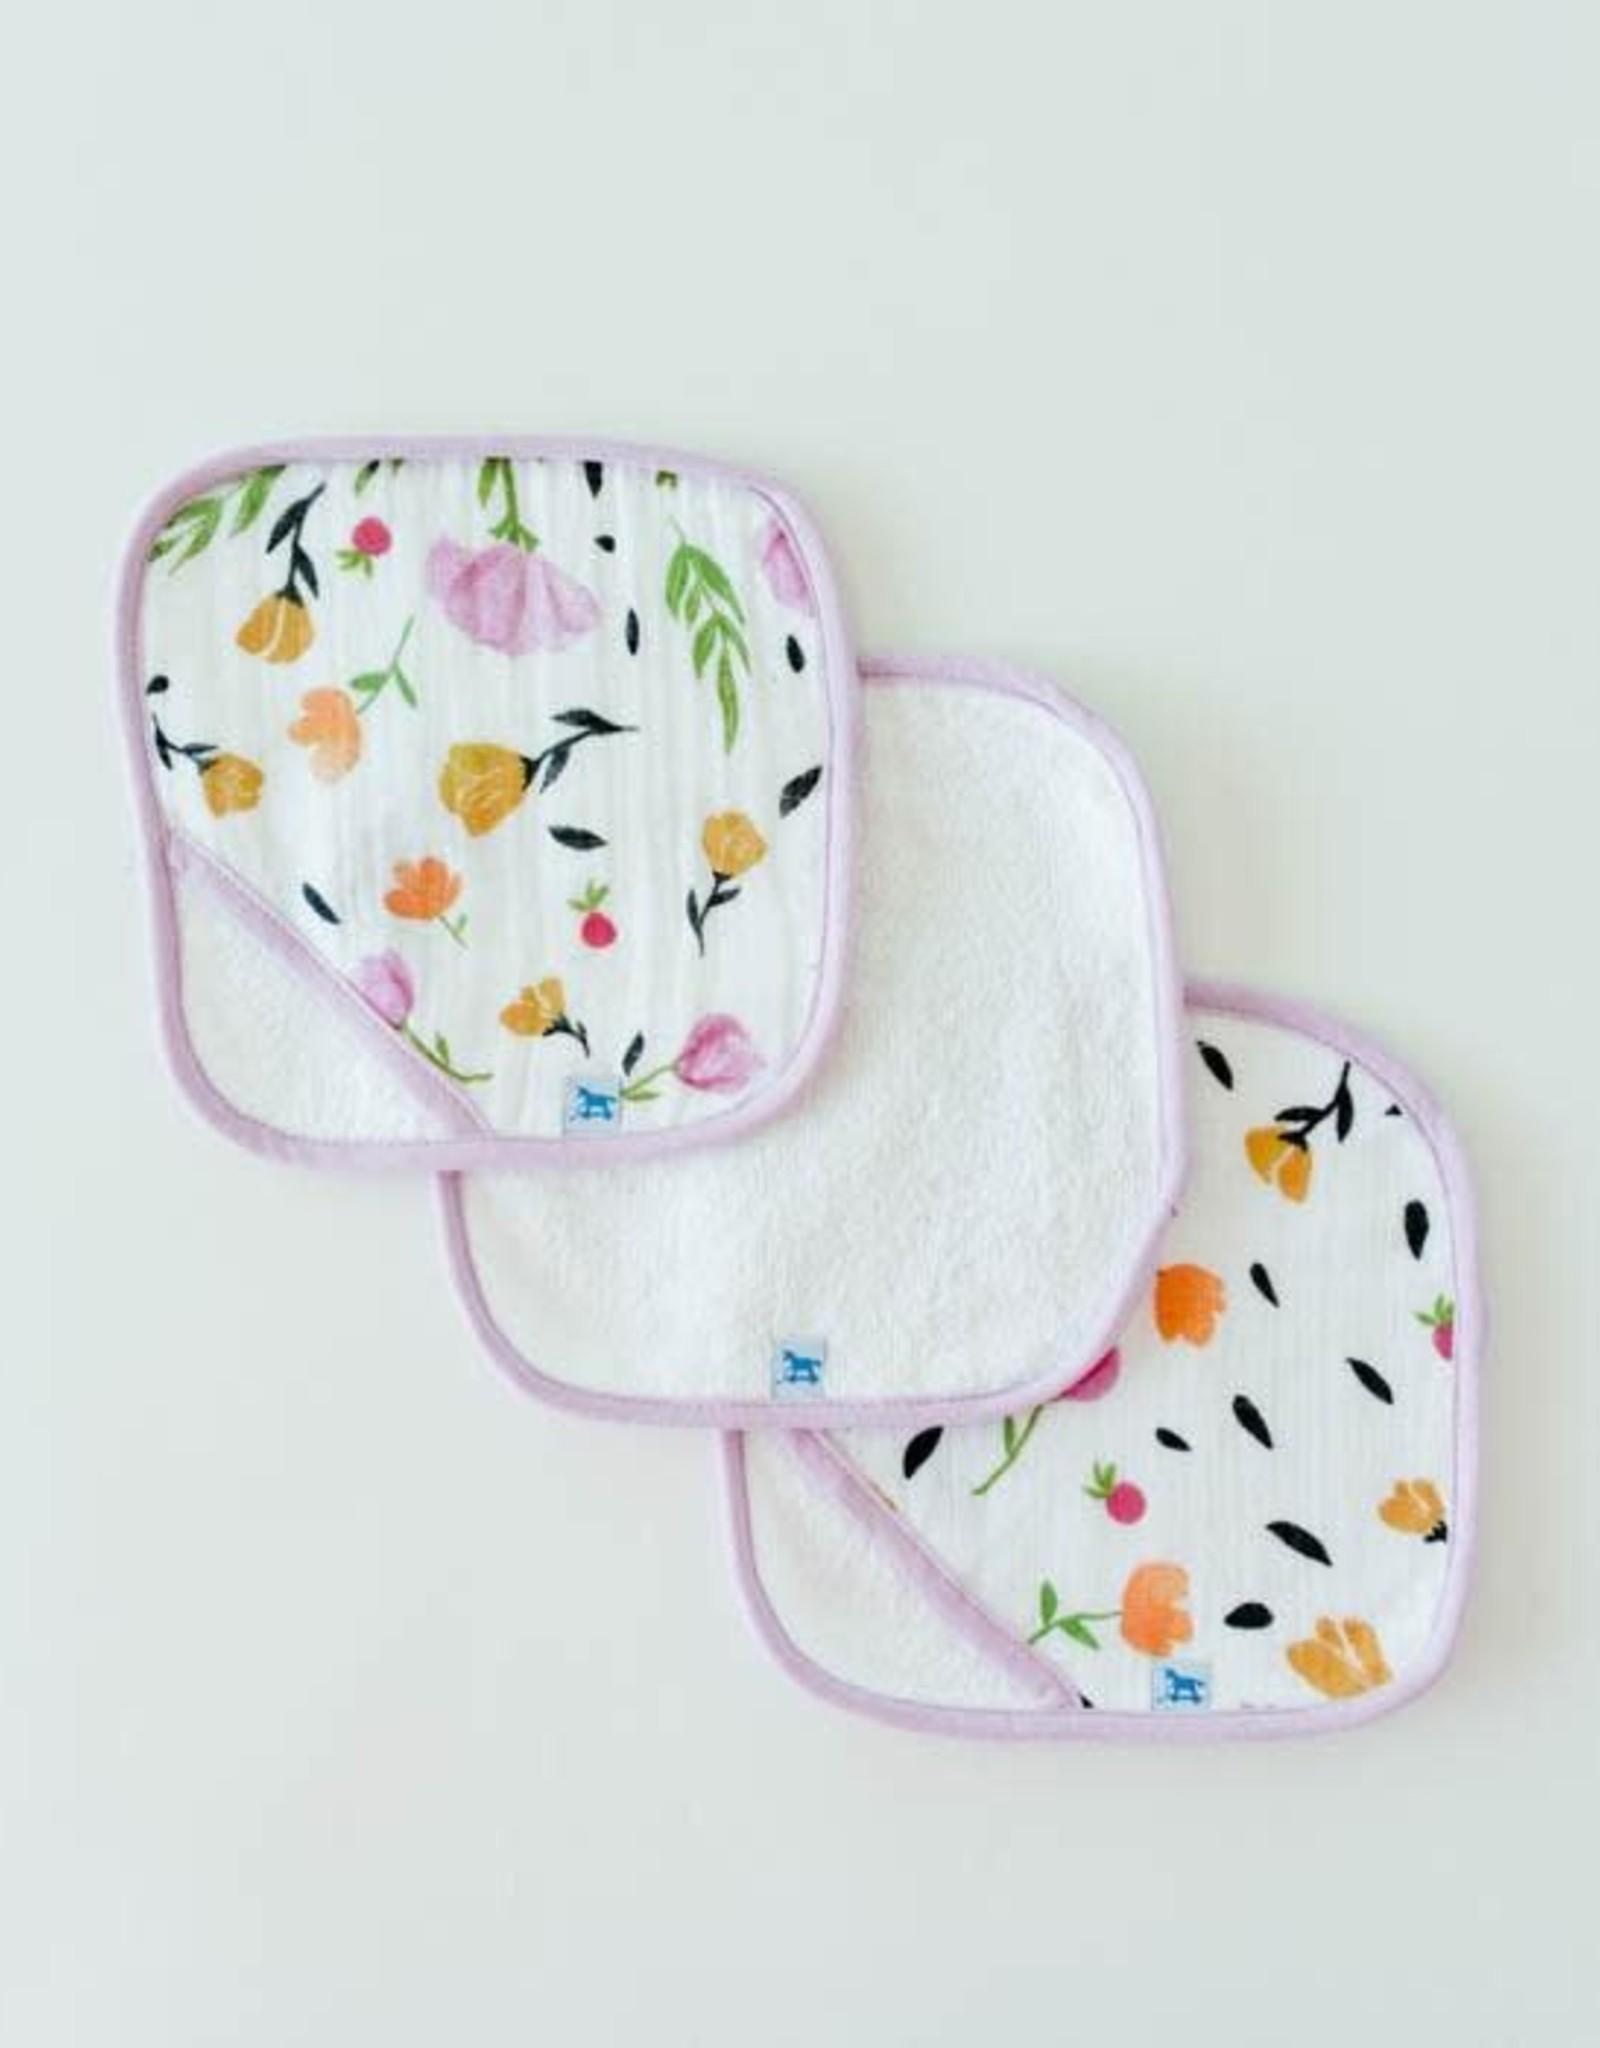 Little Unicorn Little Unicorn Washcloth Set- Berry & Bloom